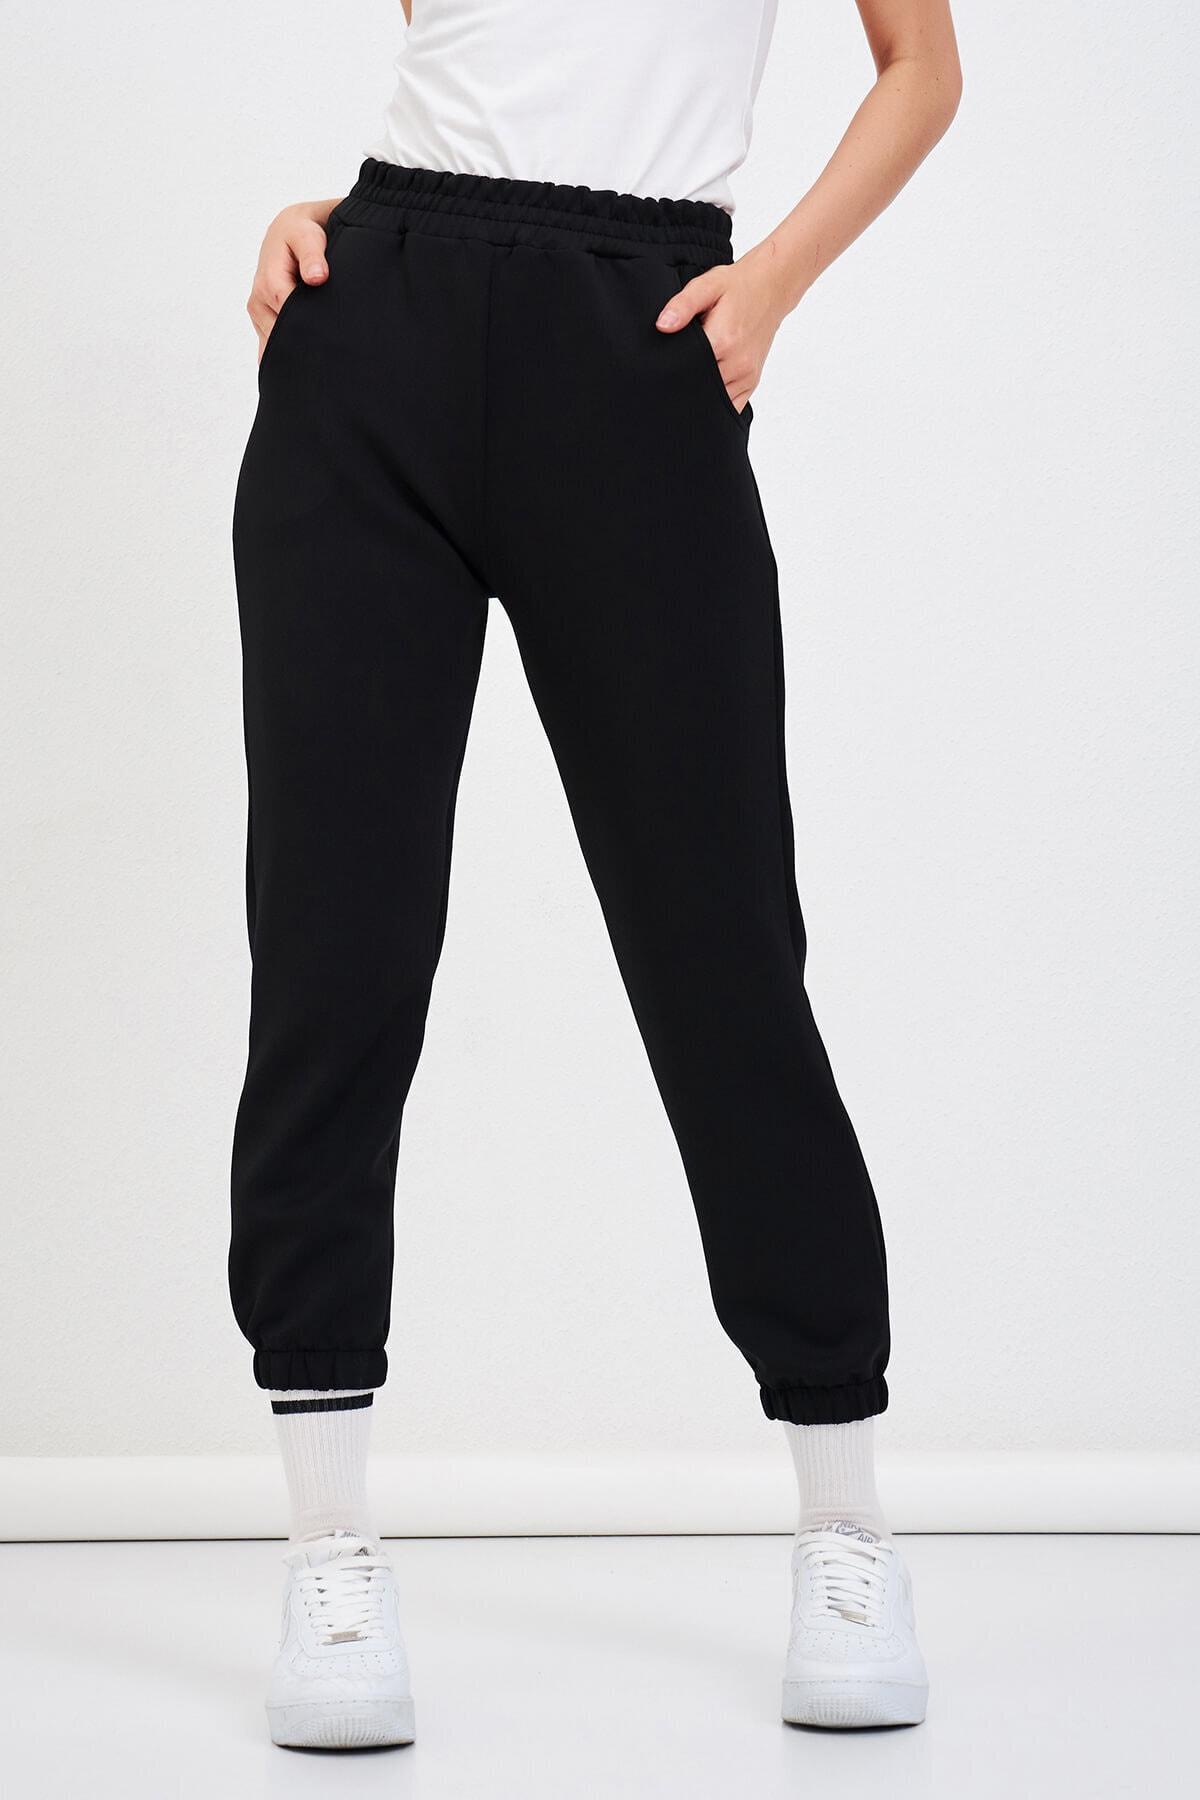 Mossta Kadın Siyah Scuba Paça Lastikli Pantolon 1